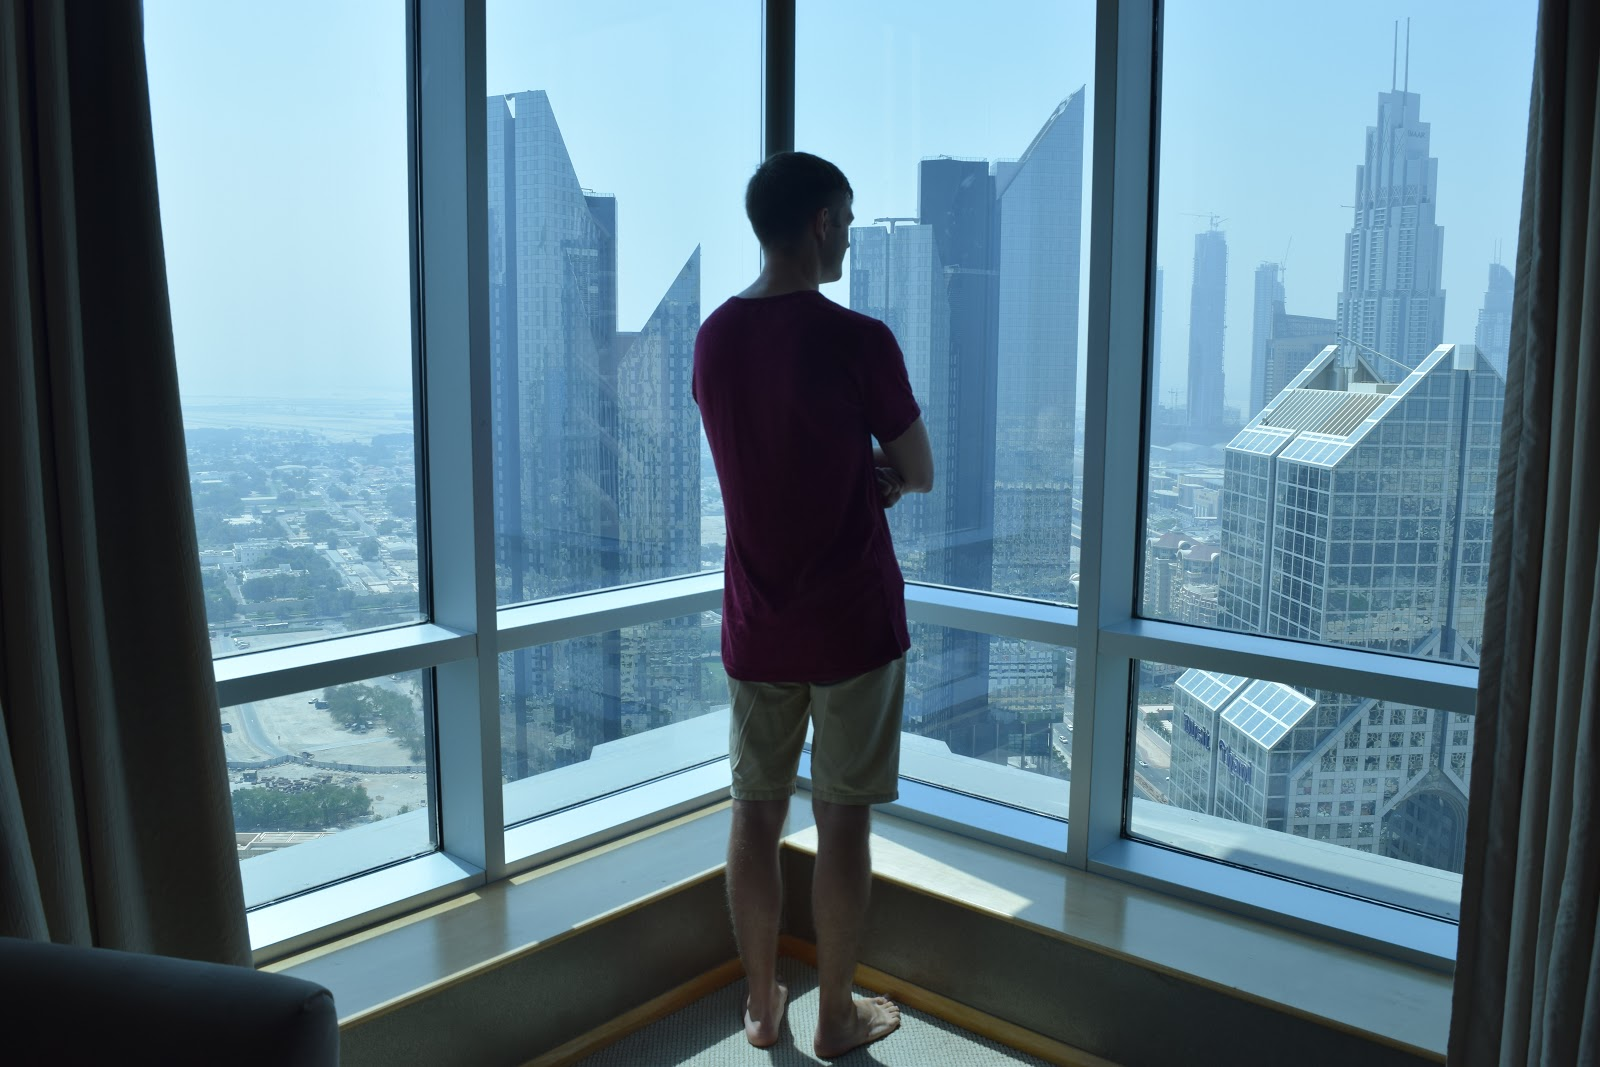 Review Shangri-La Dubai - Luxury 5 Star | Travelling Weasels